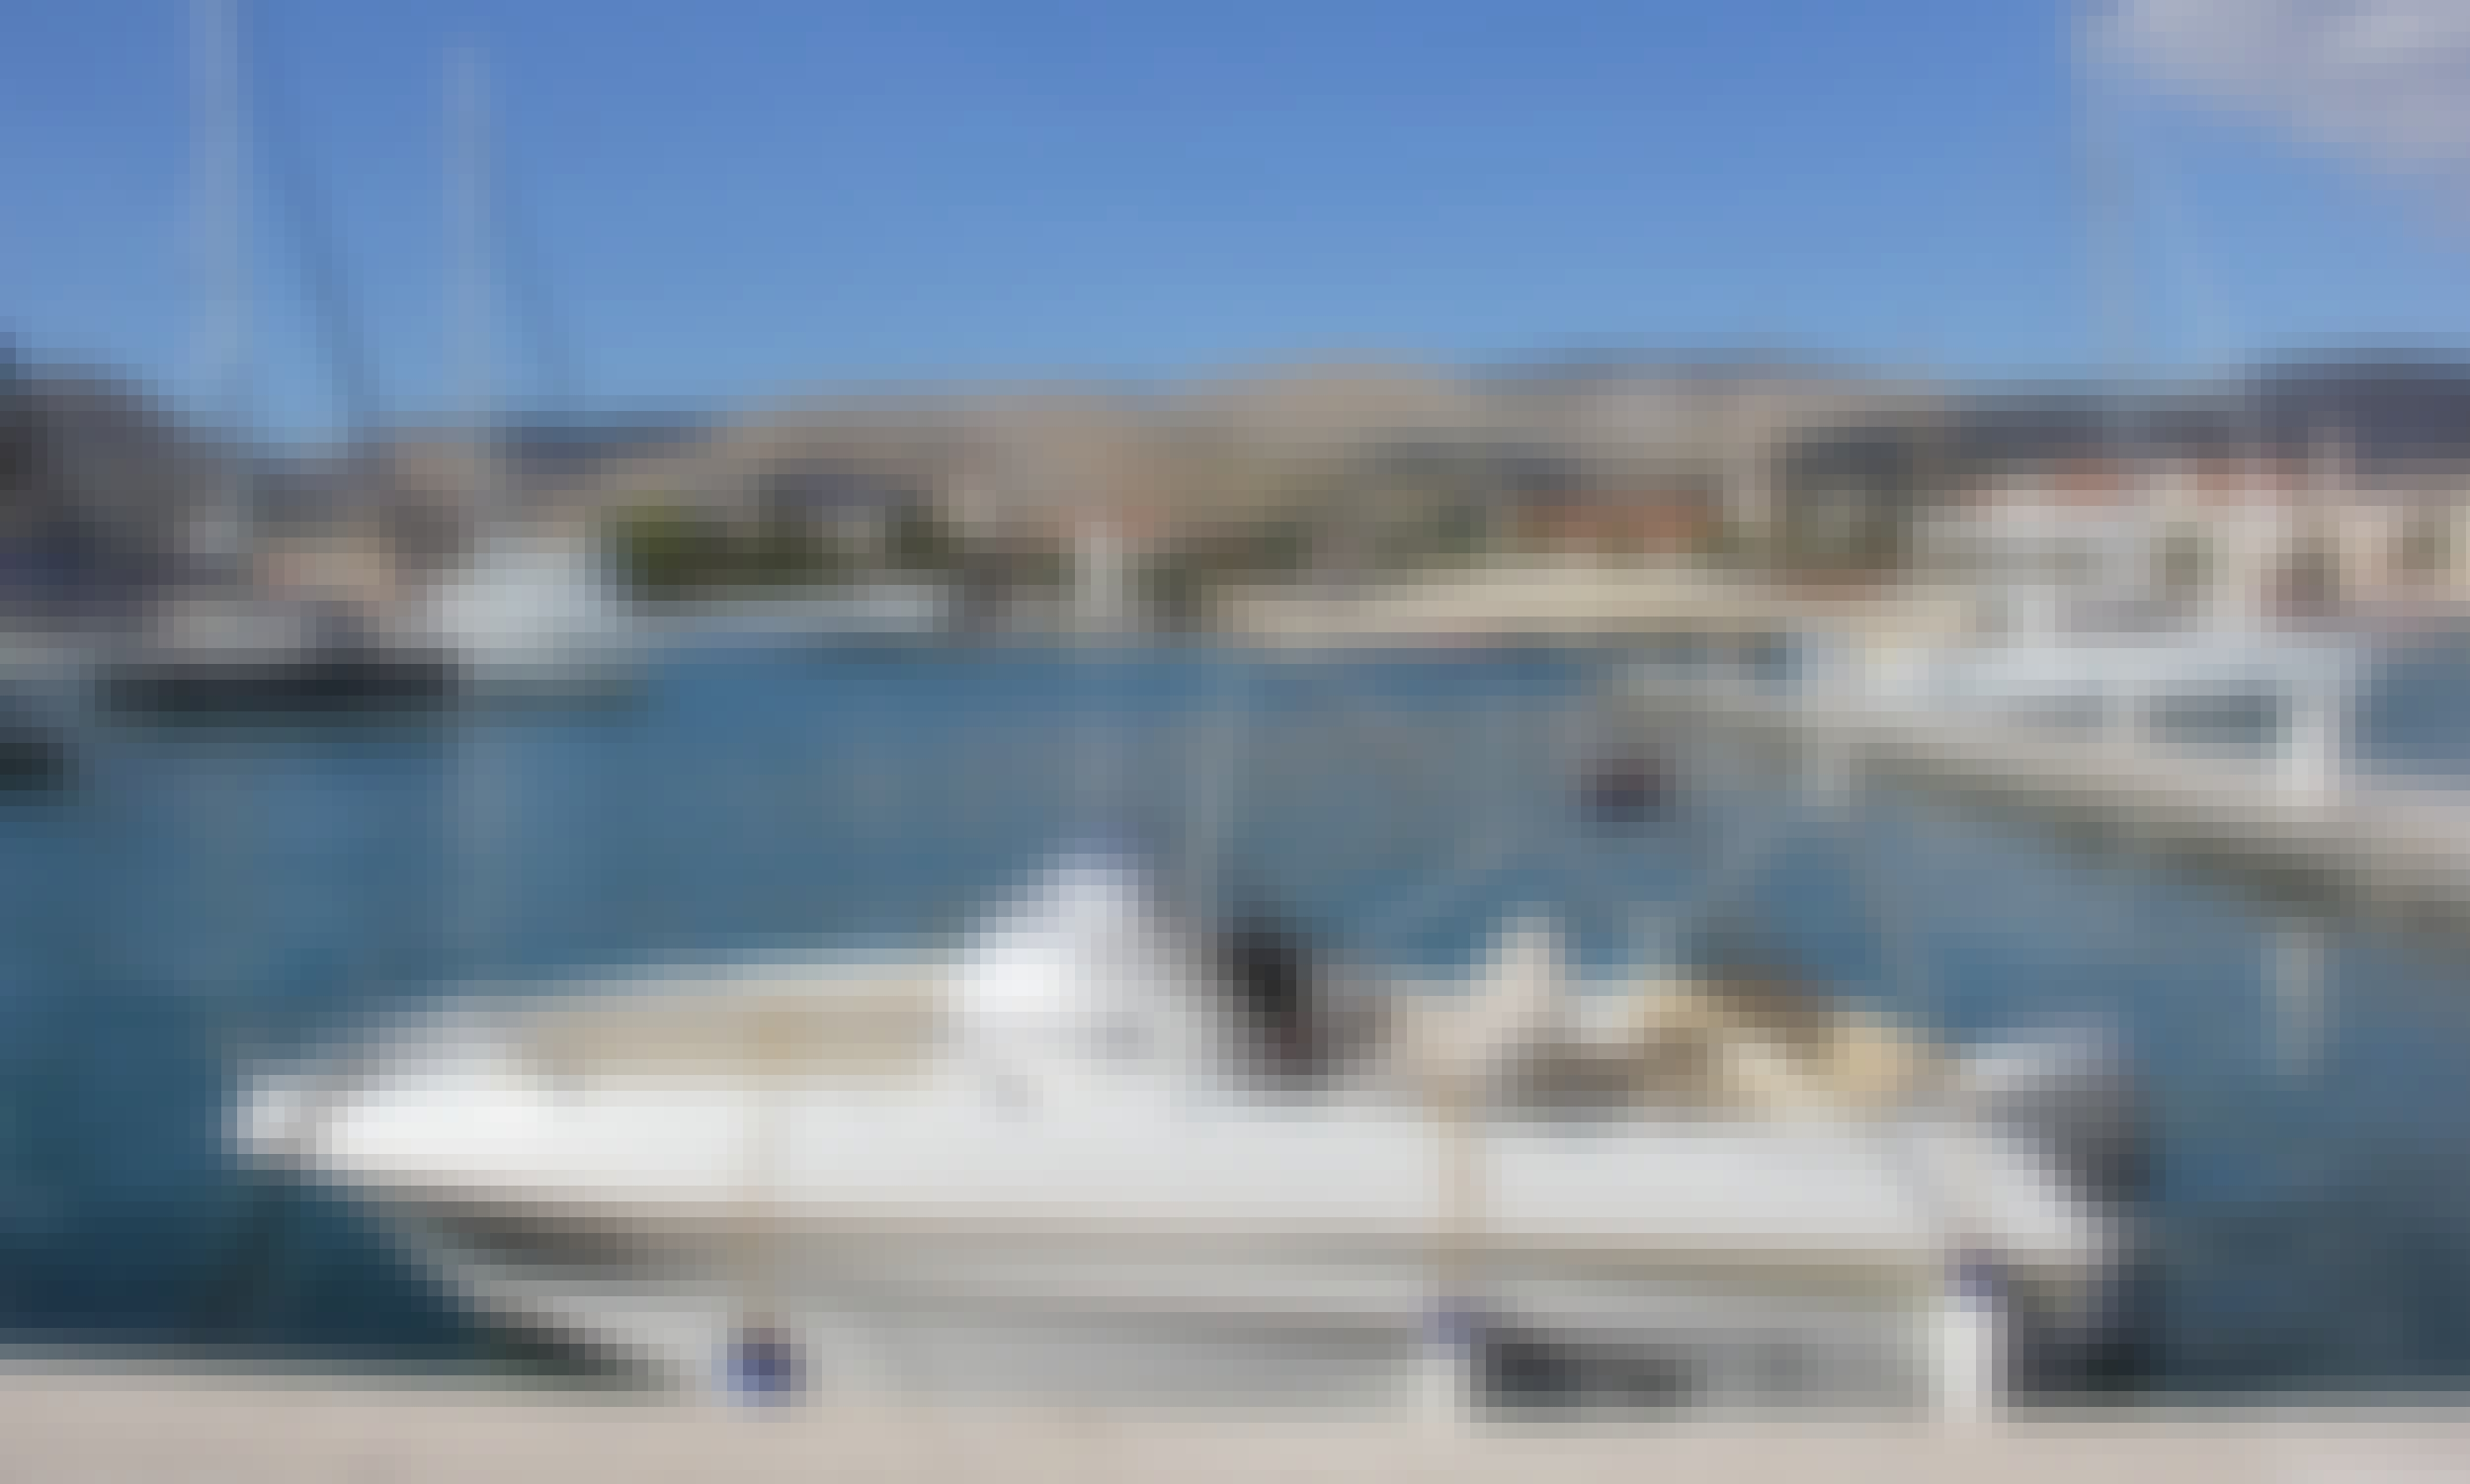 Beneteau Flyer 550 Sun Deck - Rental in Trogir, Croatia - Cuddy Cabin/Walk Around